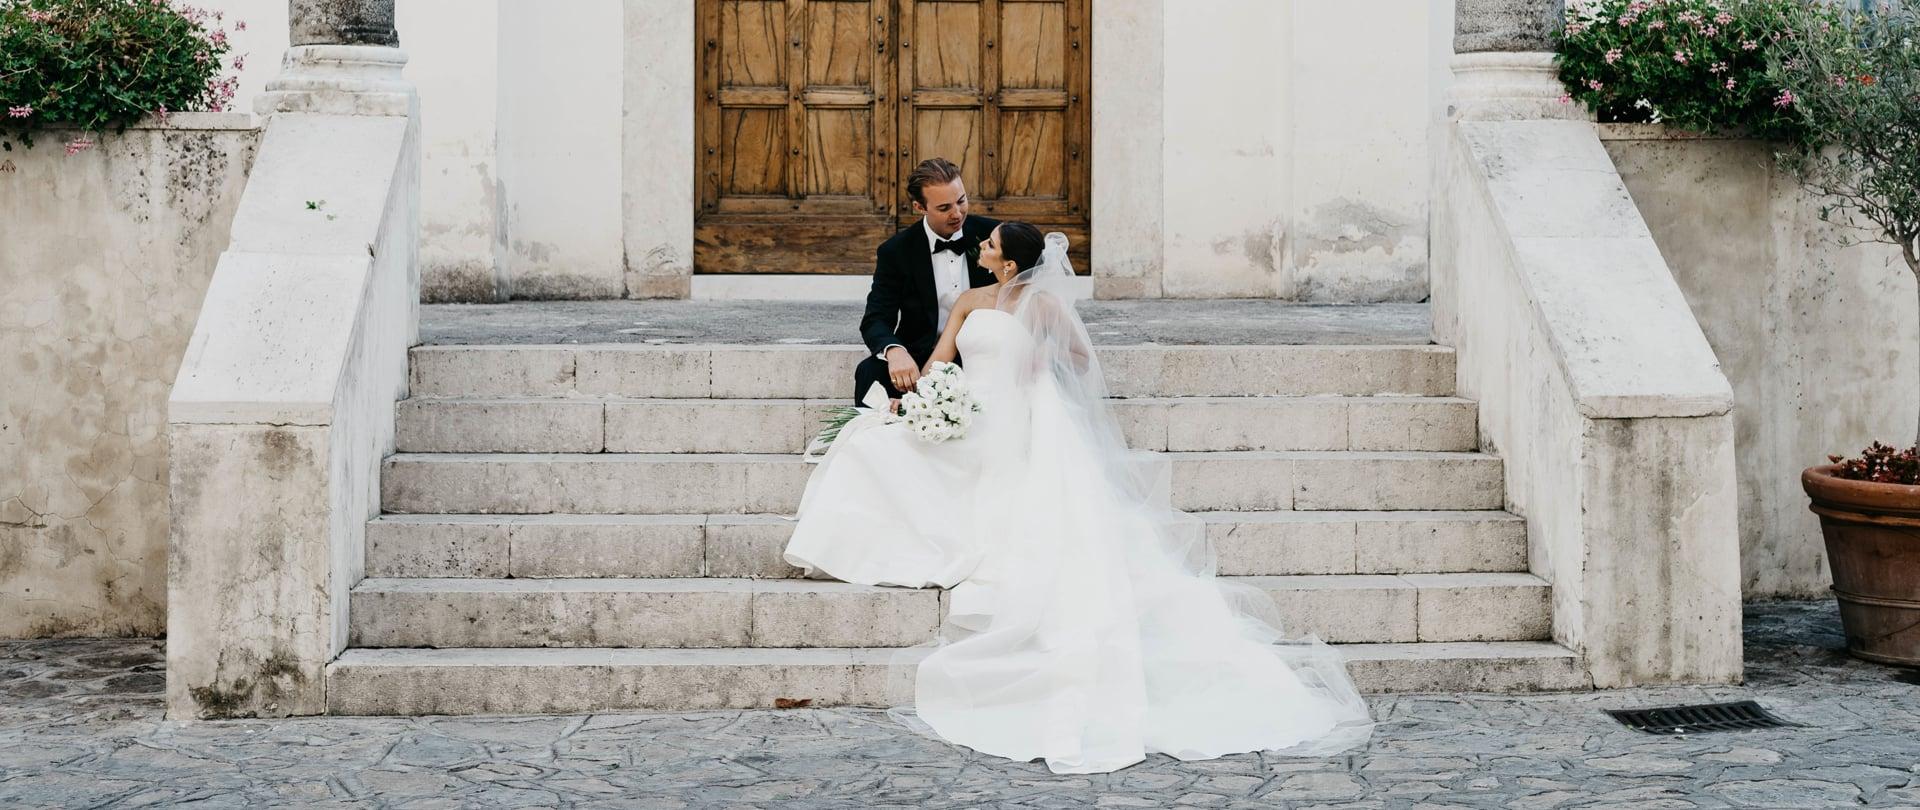 Eliane & Ben Wedding Video Filmed at Ravello, Italy